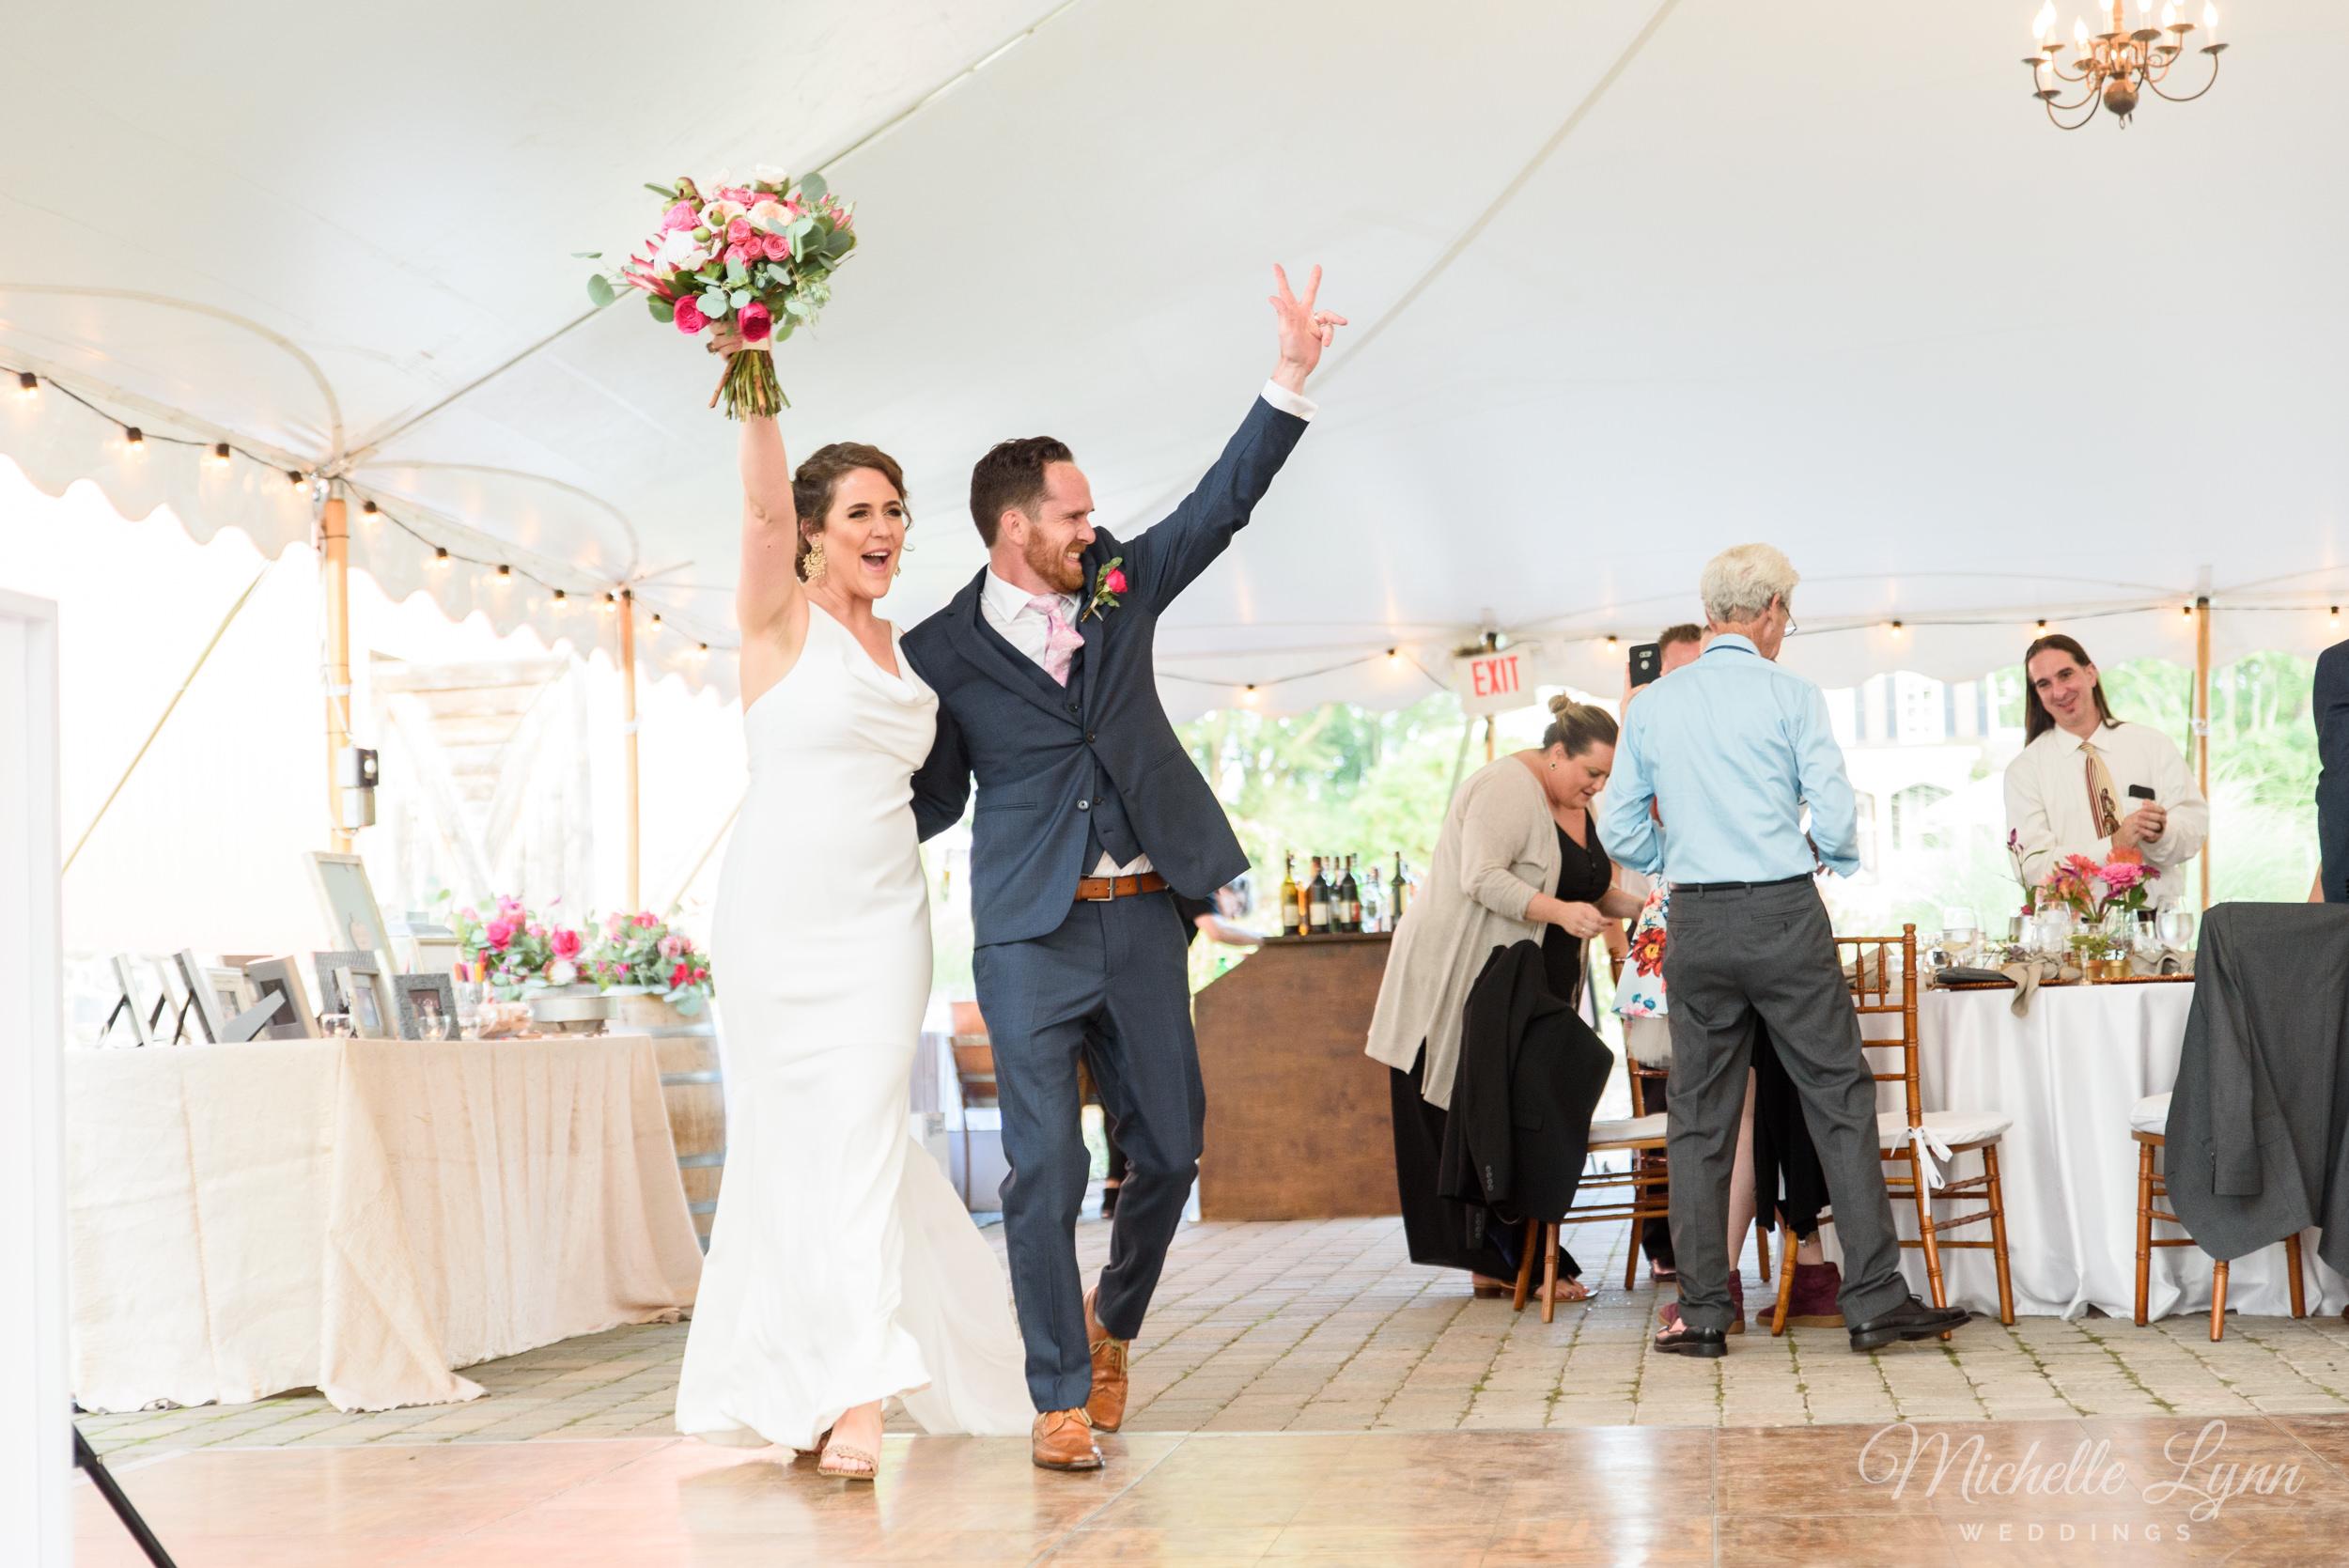 mlw-unionville-vineyards-nj-wedding-photography-79.jpg